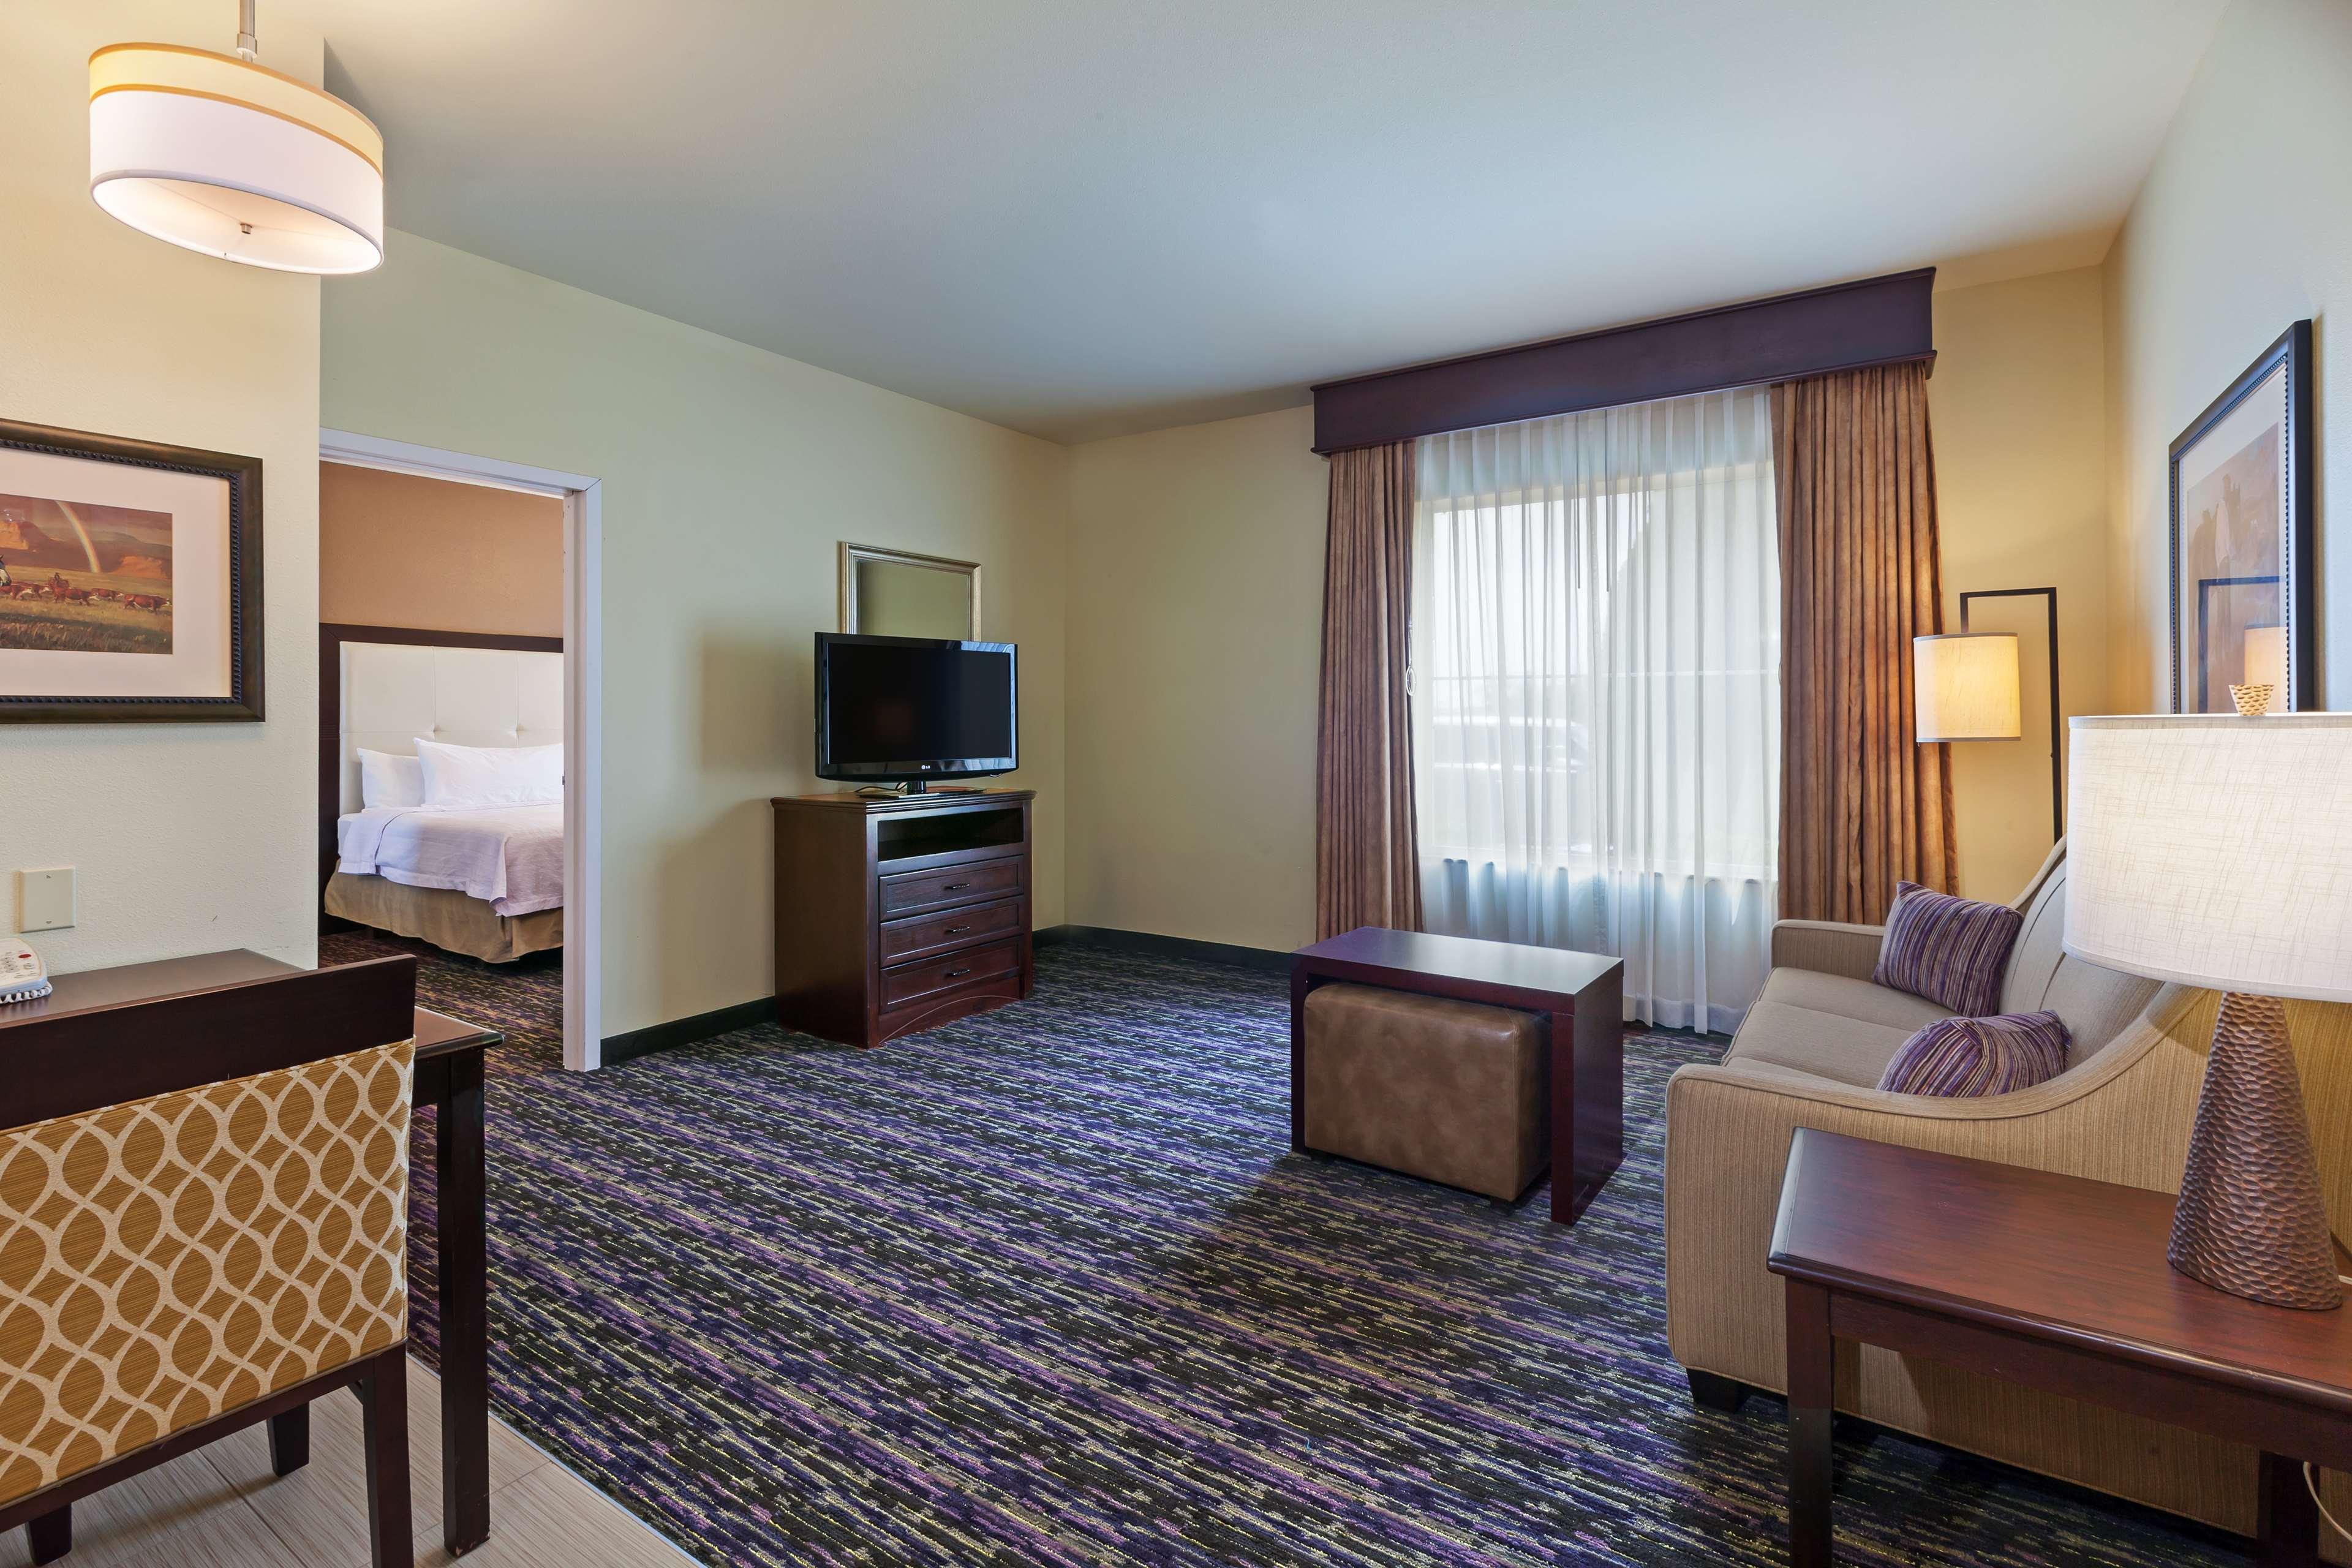 Homewood Suites by Hilton Wichita Falls image 22